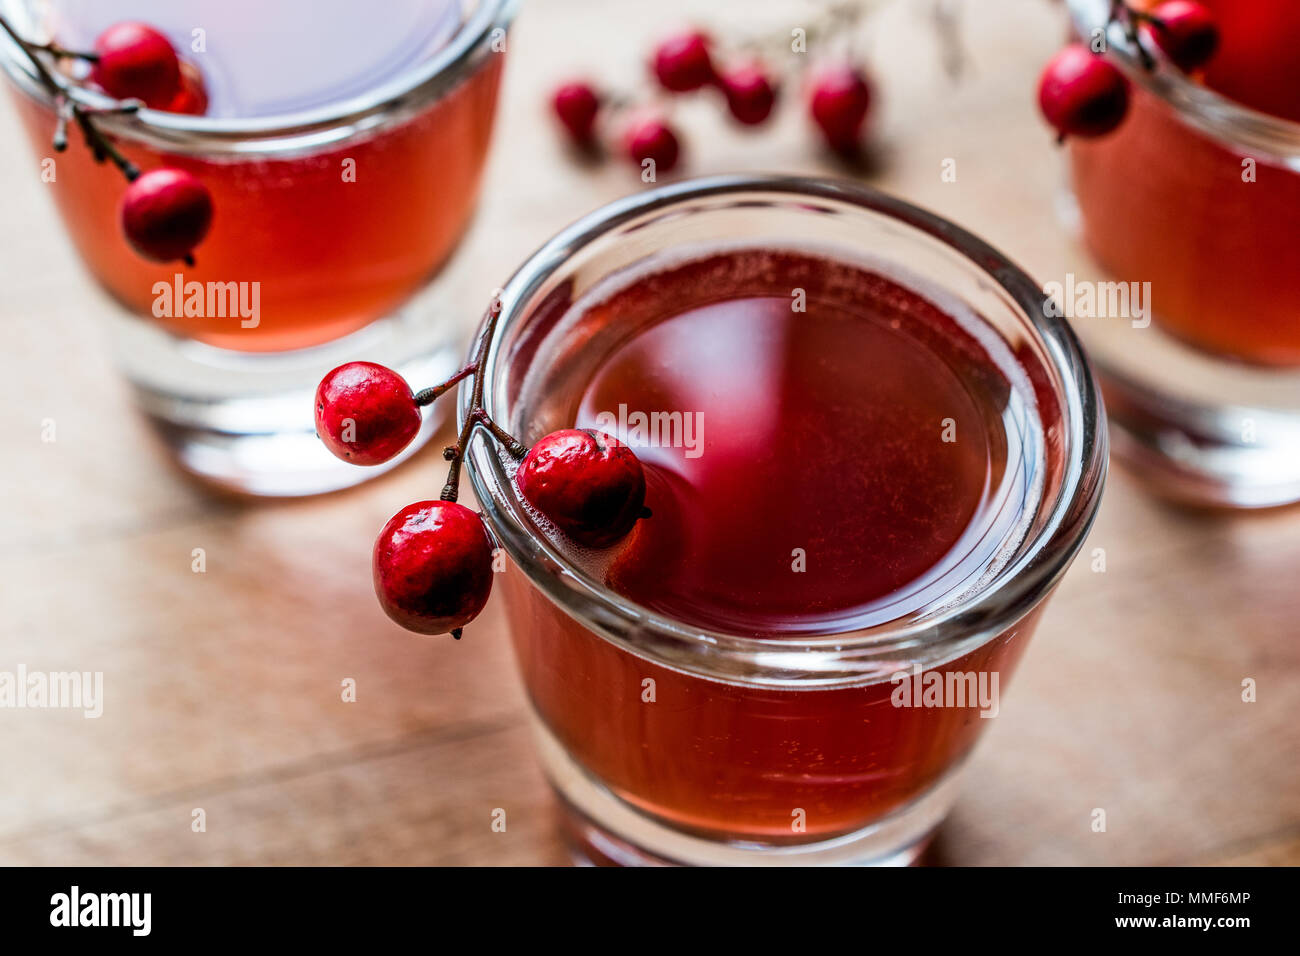 Cranberry cocktail shot with vodka. Beverage Concept. - Stock Image